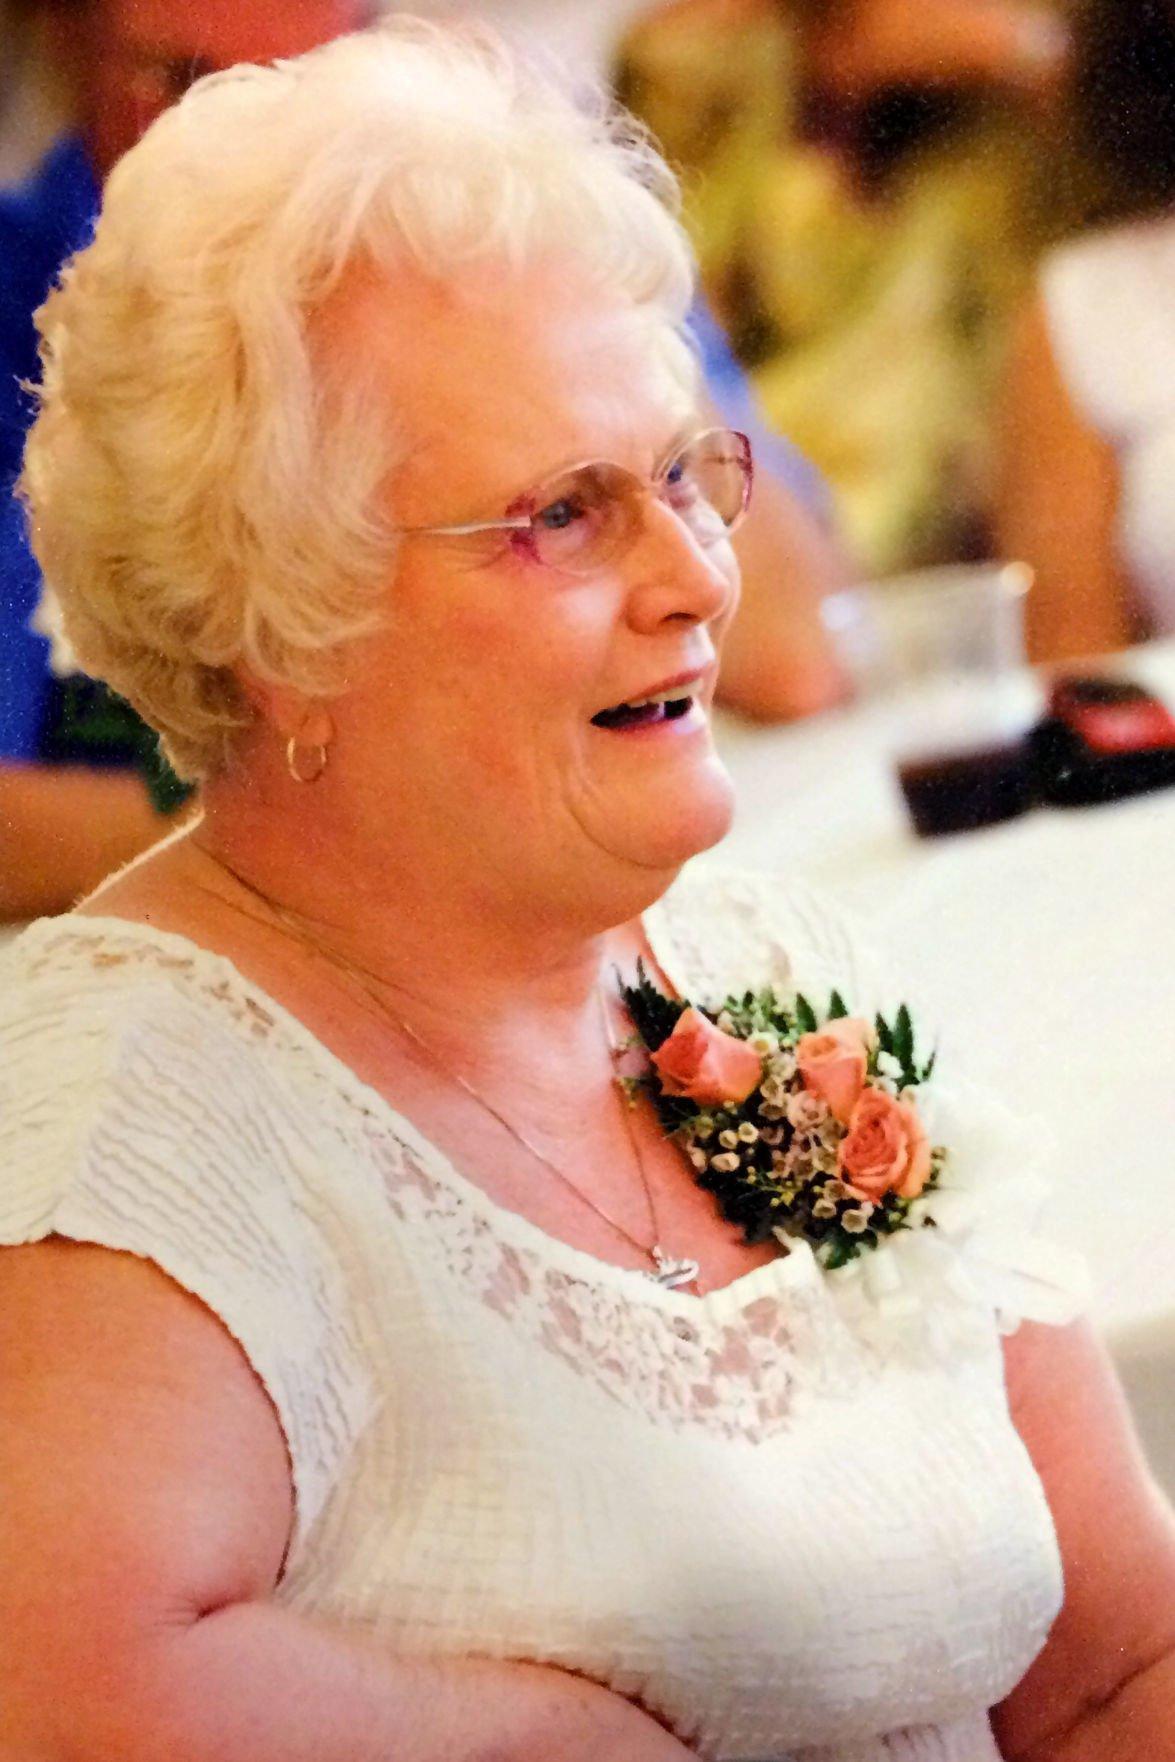 Margaret 'Lois' Wilson Bias